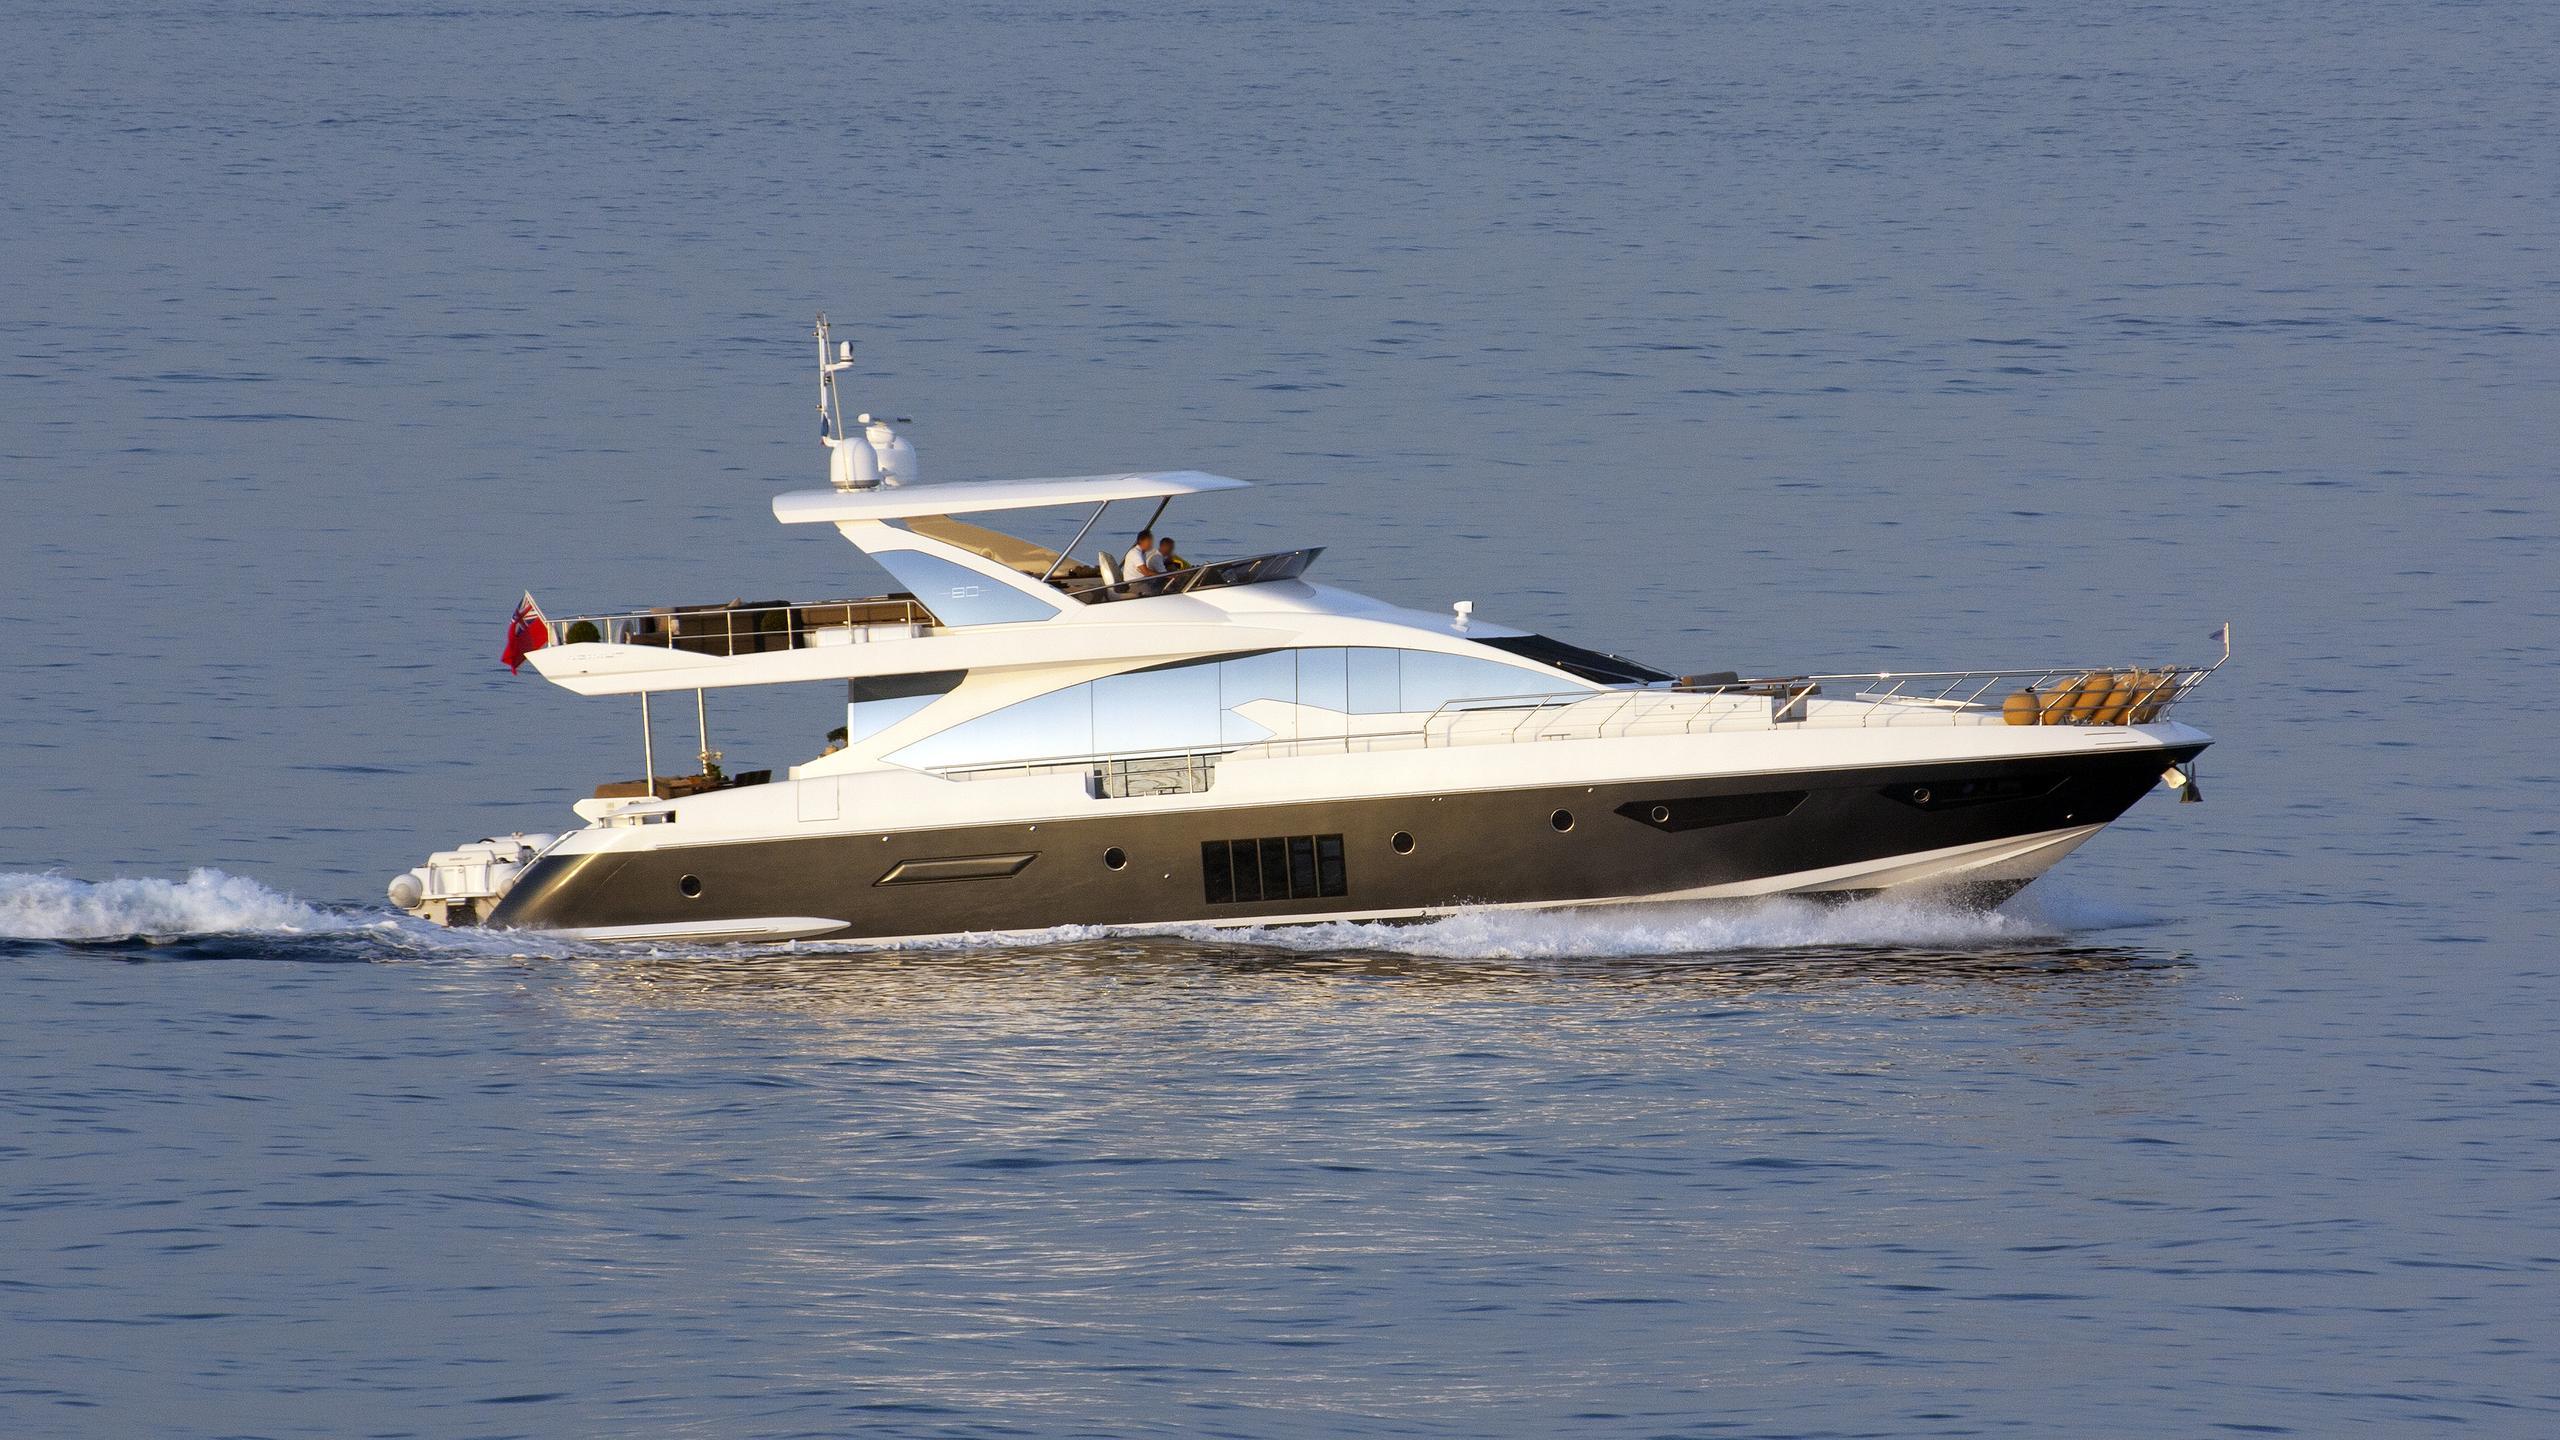 adel-motor-yacht-azimut-80-2014-25m-cruising